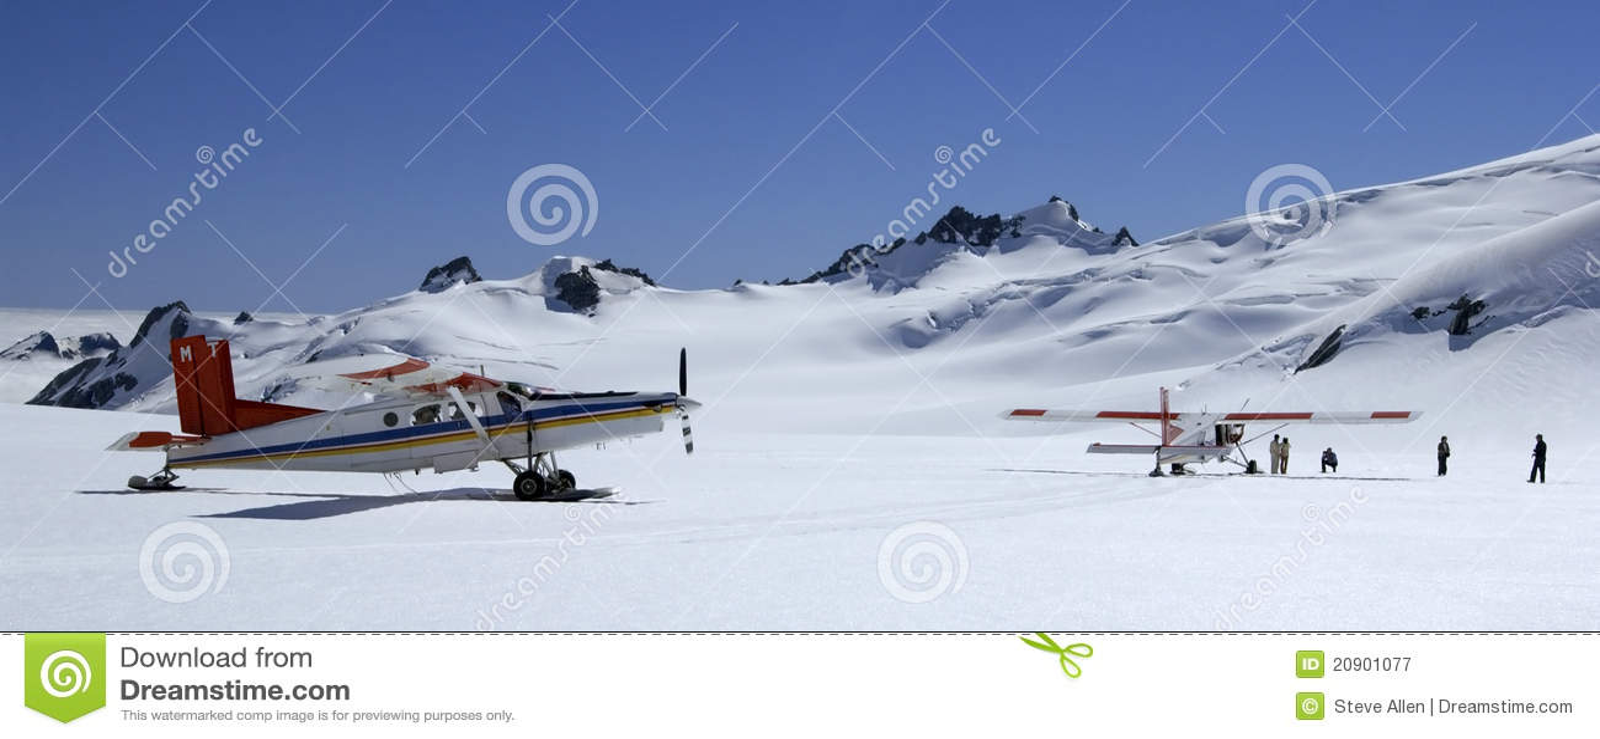 Tourist Flights - Mount Cook - New Zealand